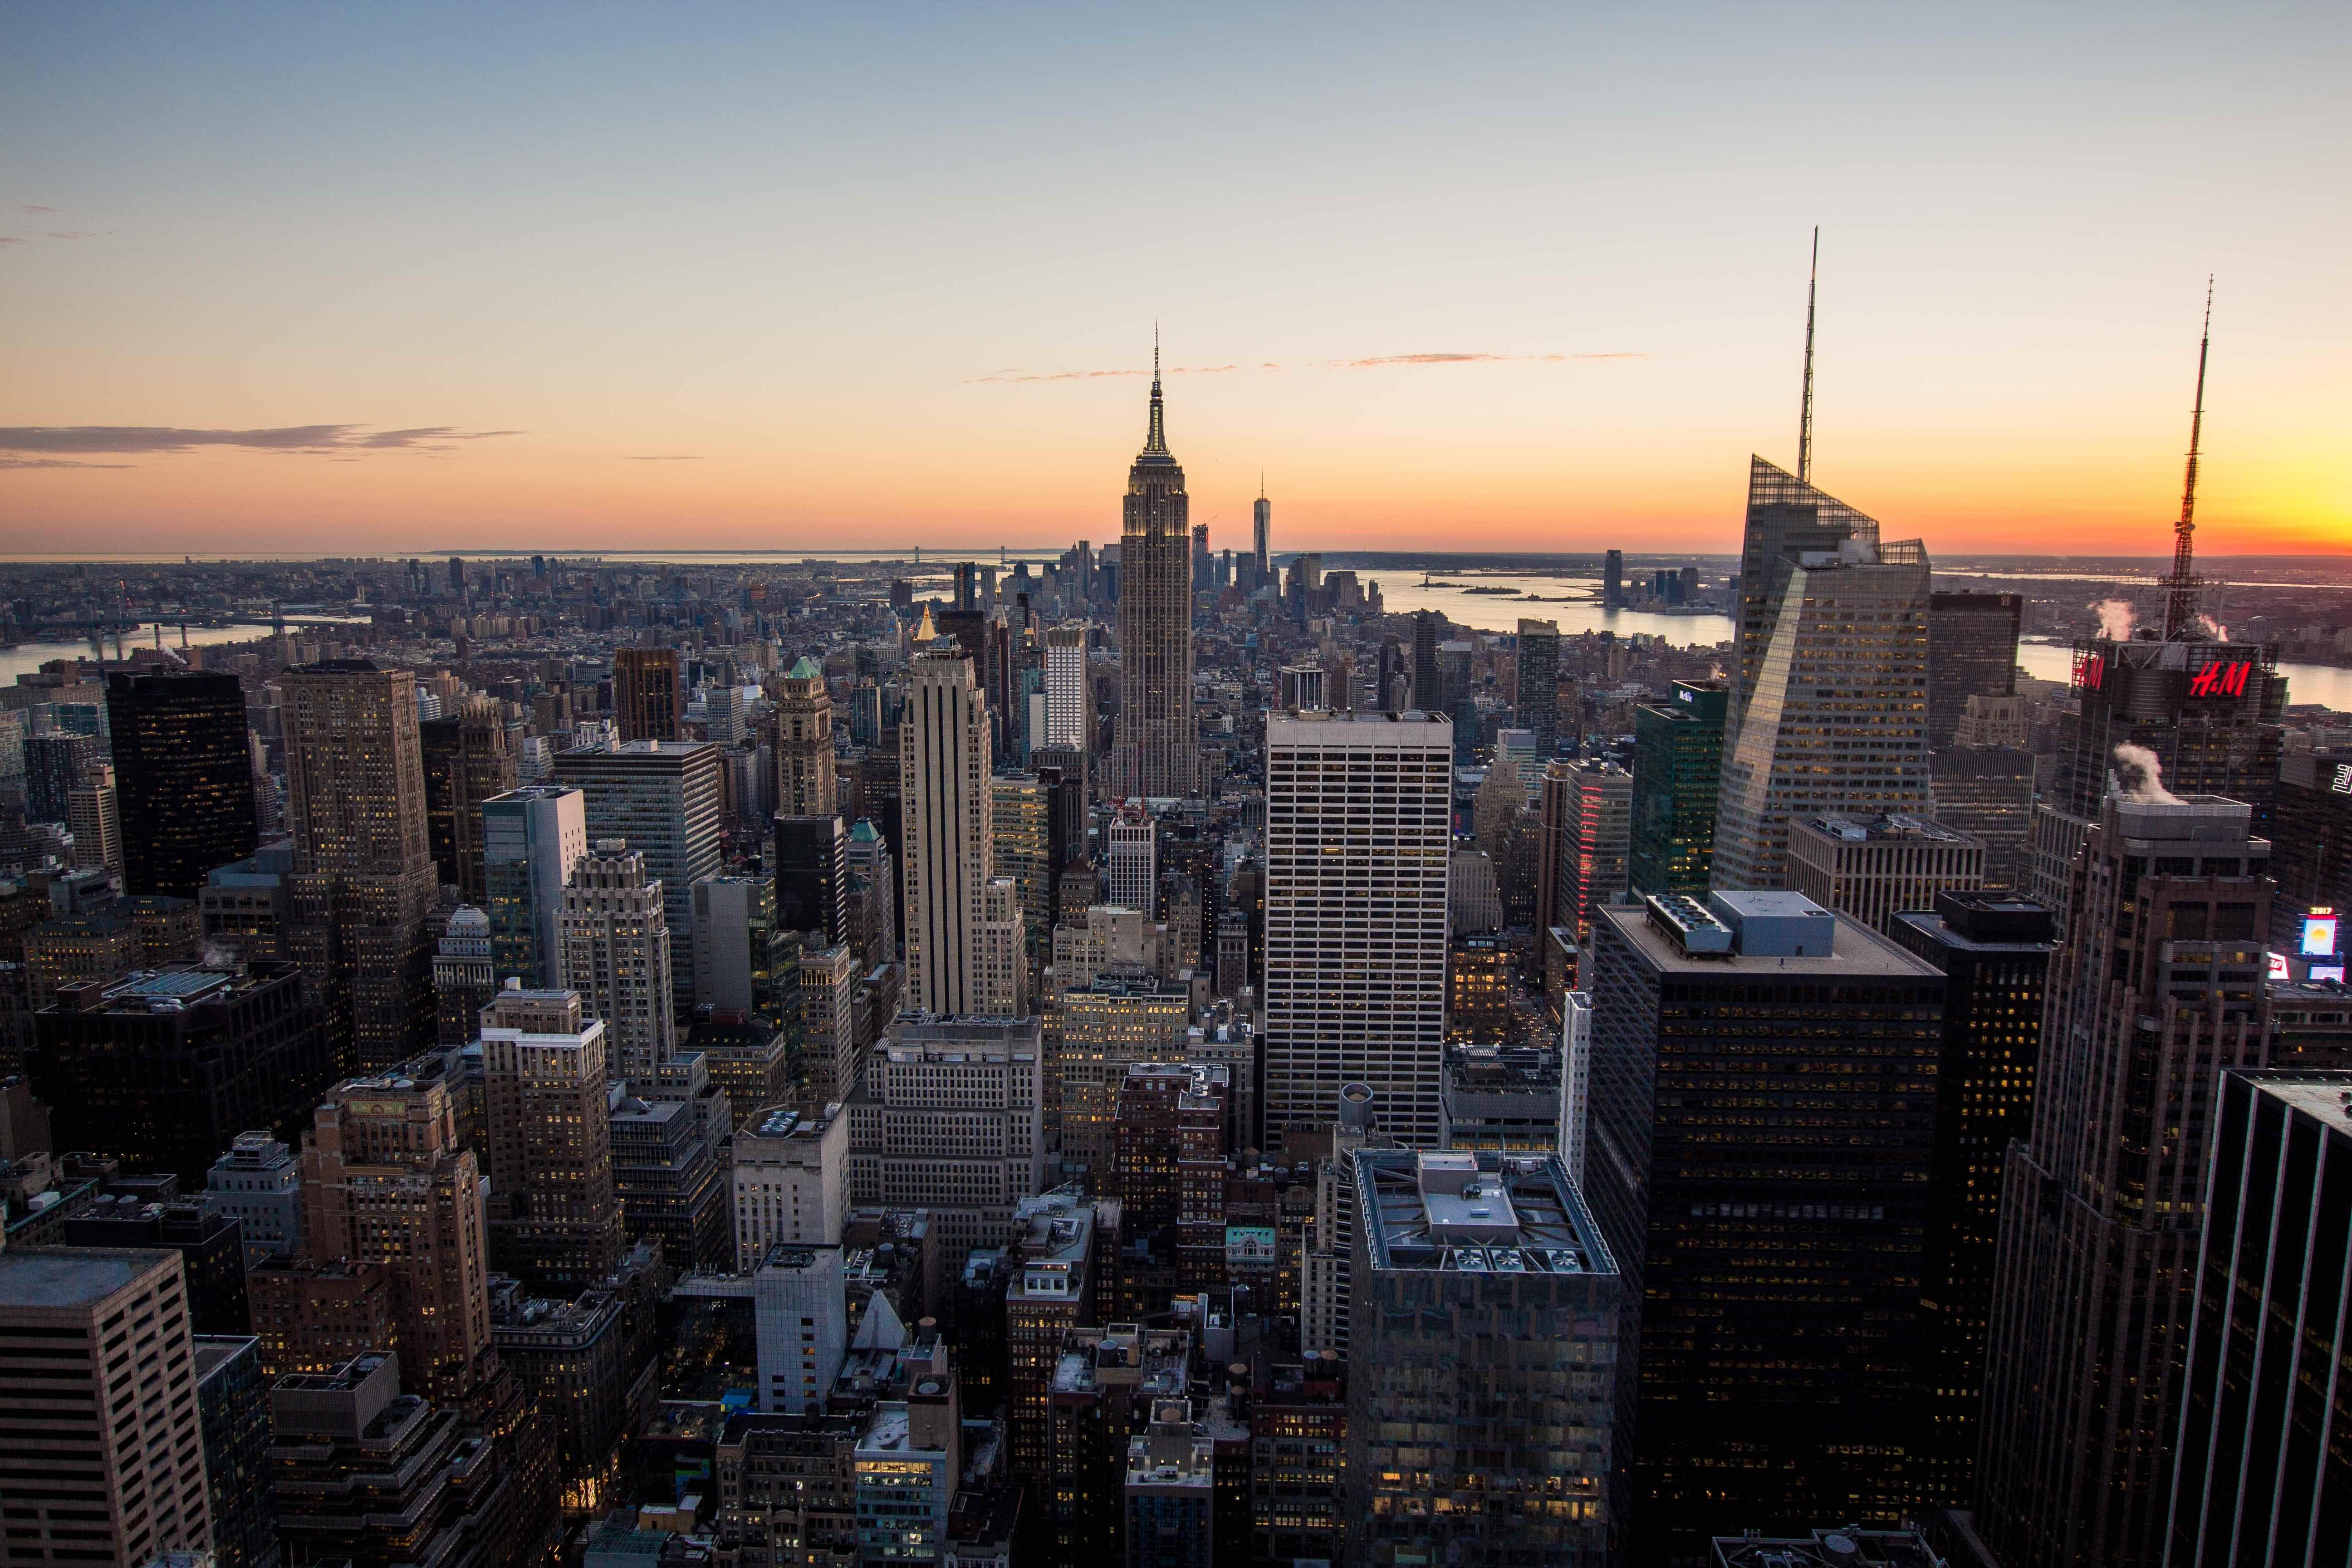 The skyline of Manhattan during sunset